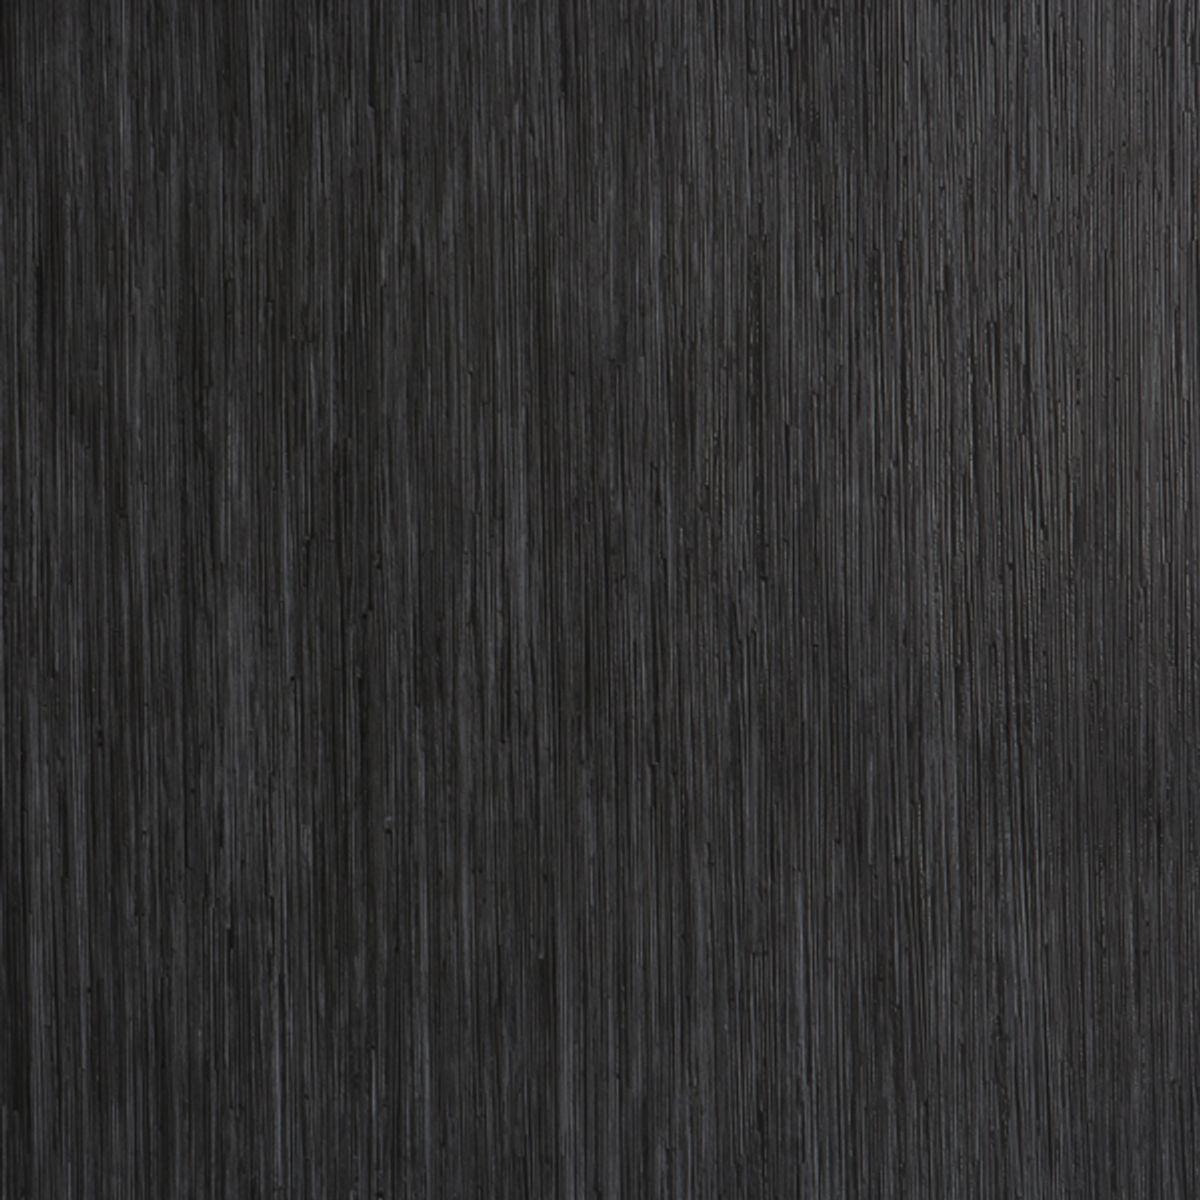 Sol vinyle Verone noir 200cm